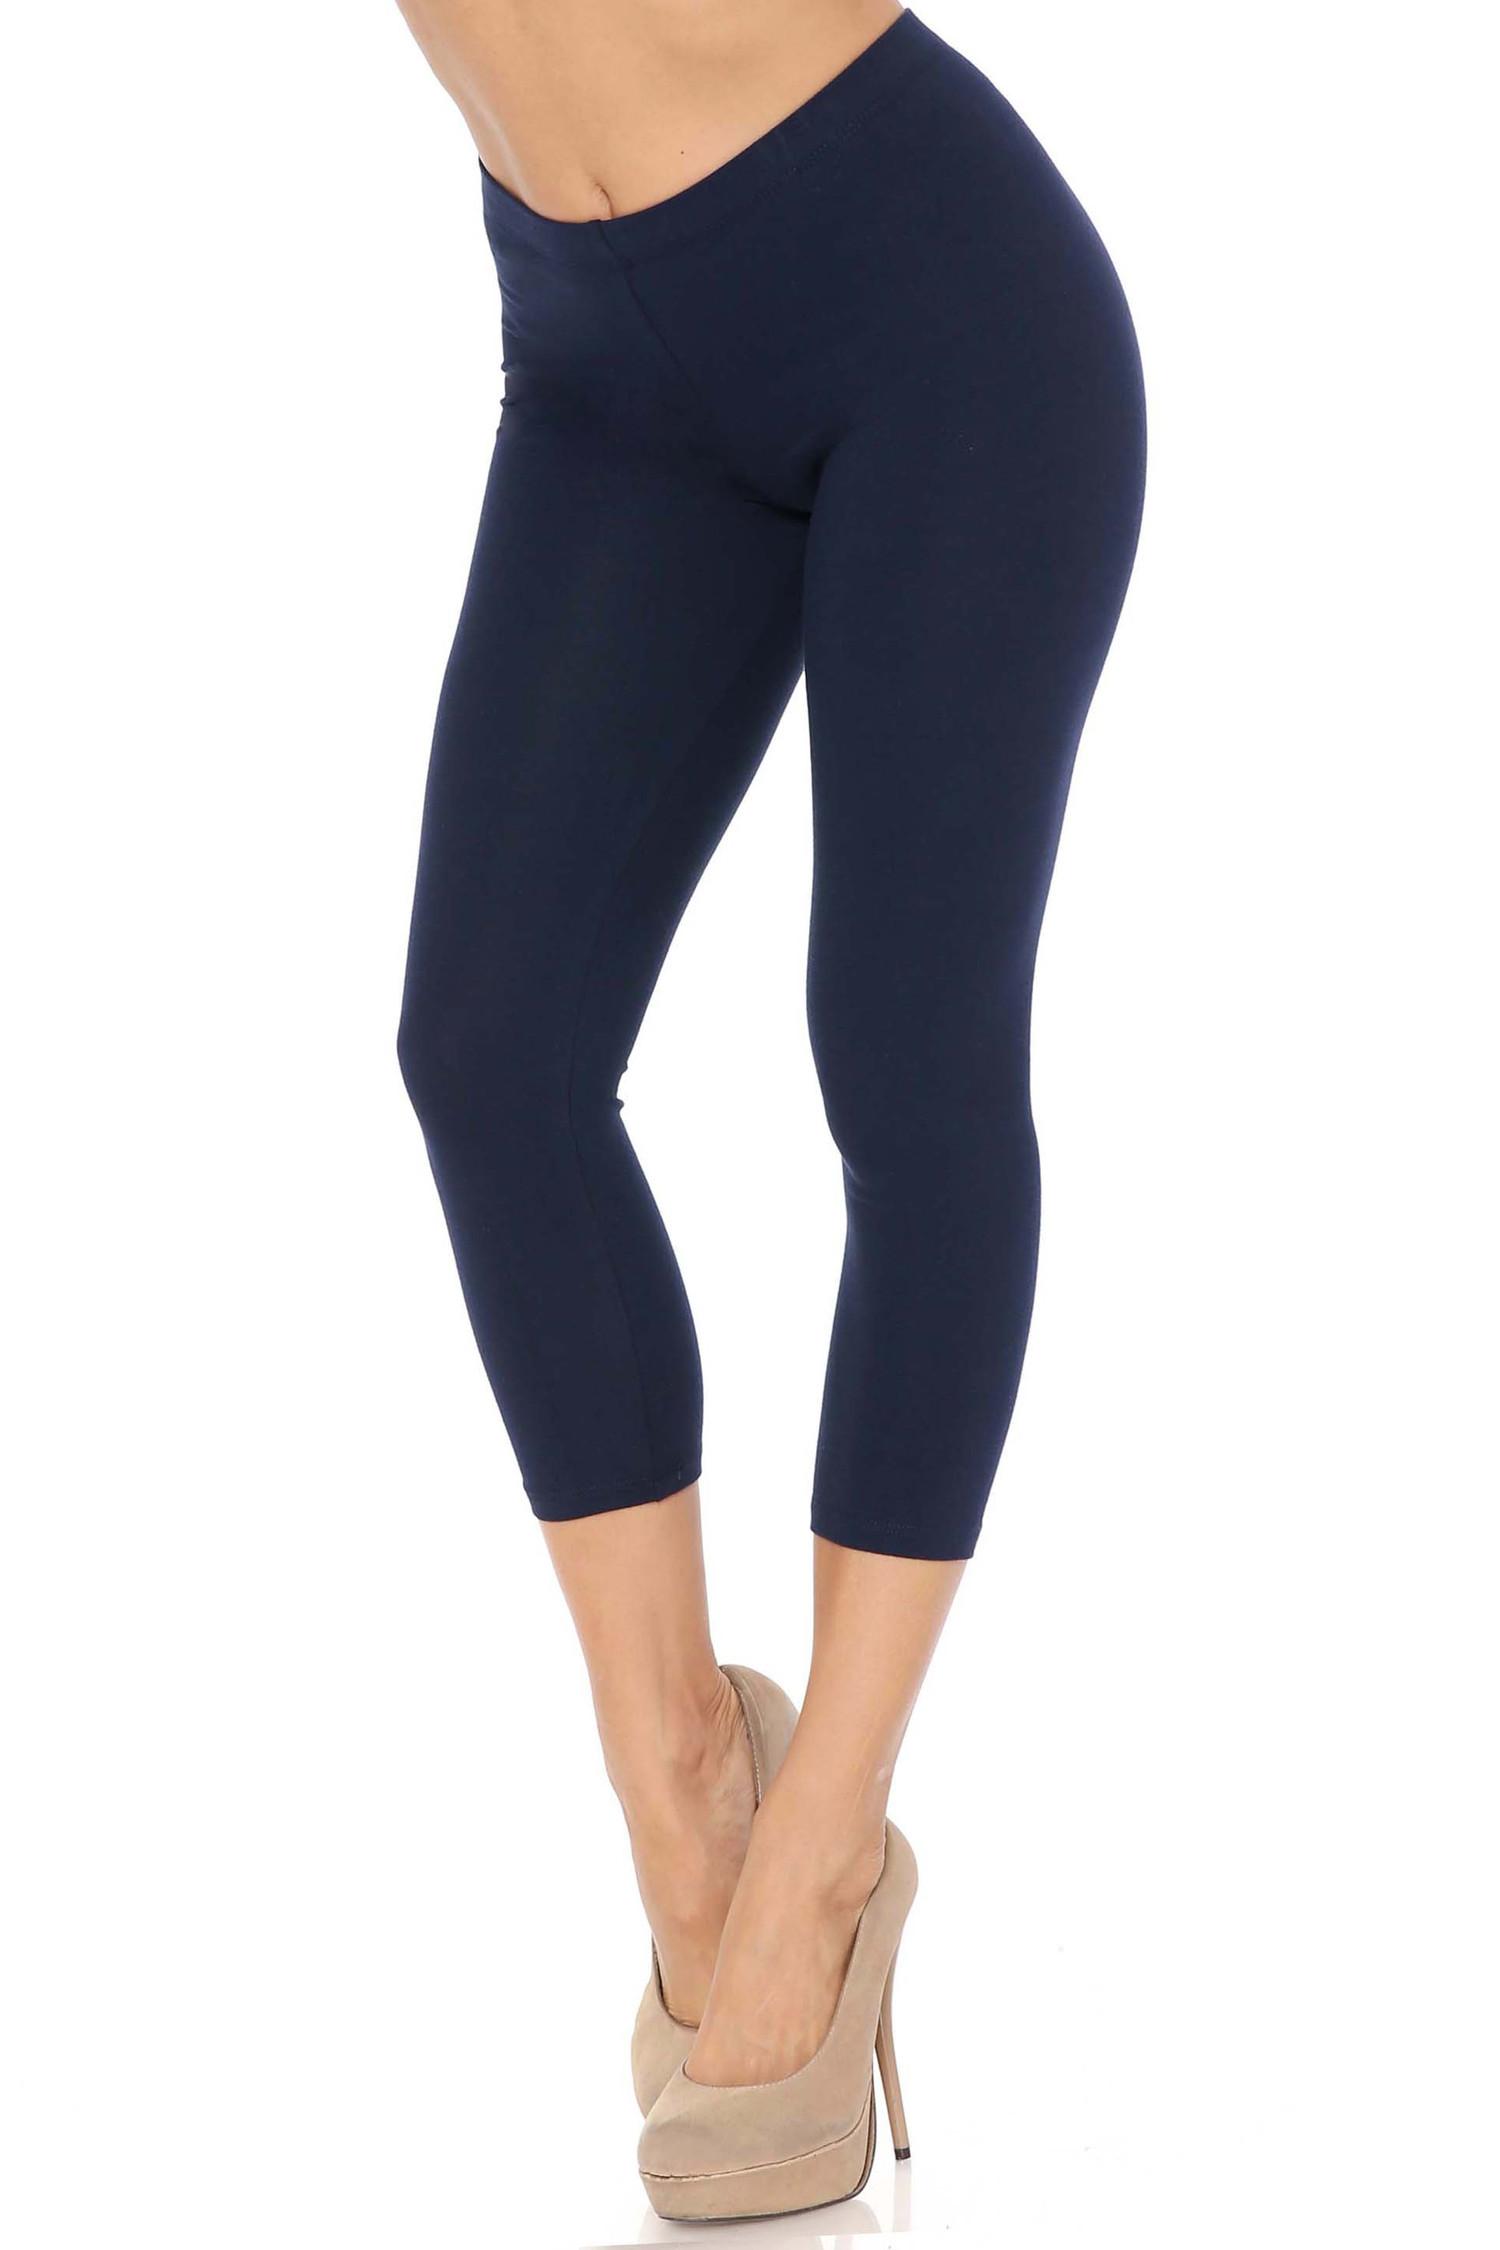 45 degree angle of navy USA Cotton Capri Length Leggings